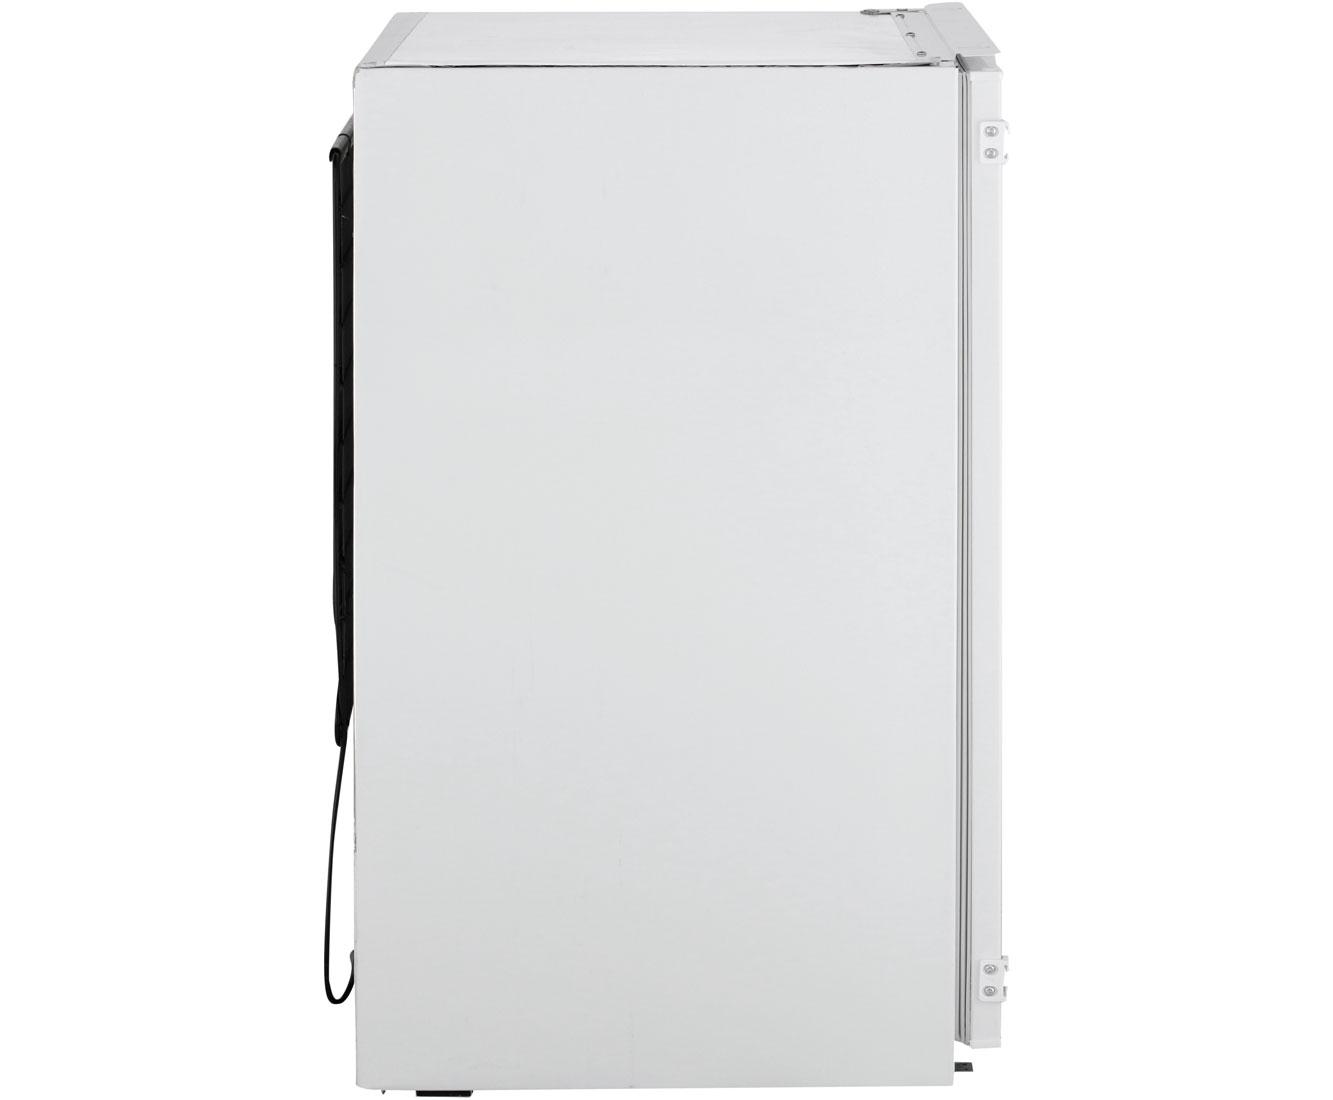 Amica Kühlschrank 50 Cm : Kühlschrank amica vks r bei hornbach kaufen